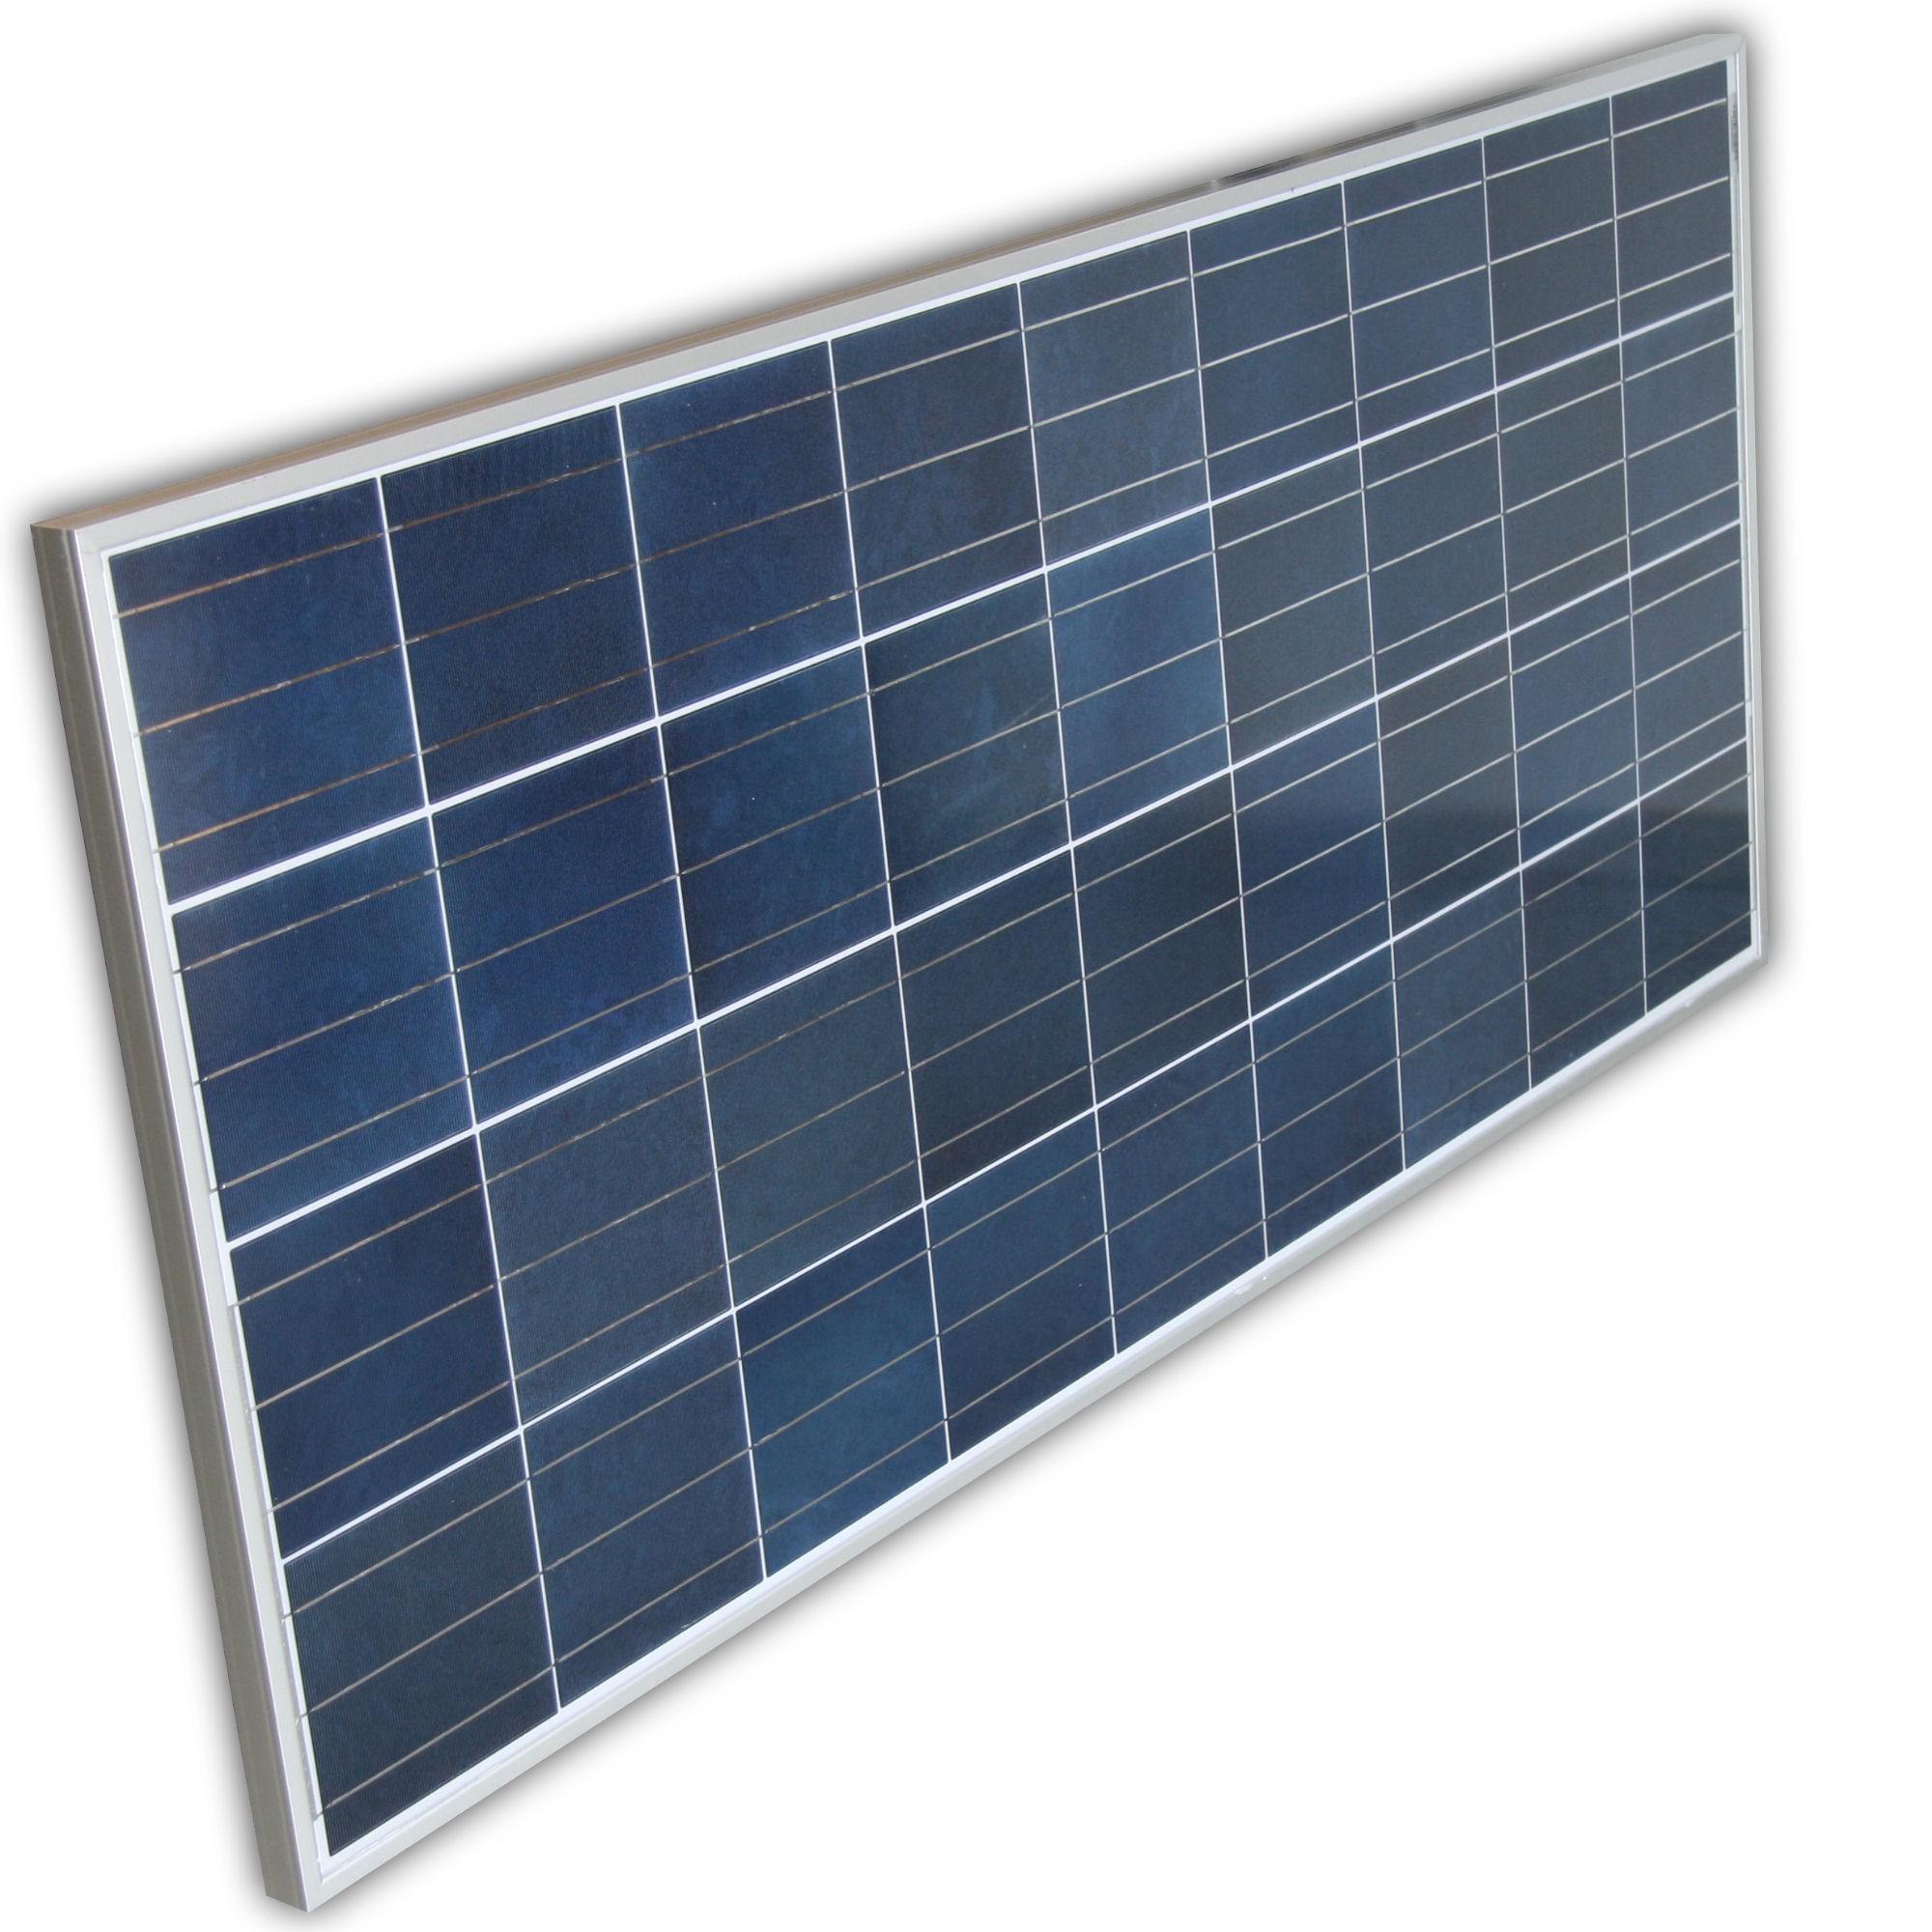 solarpanel 12v solarmodul solarzelle polykristallin 12. Black Bedroom Furniture Sets. Home Design Ideas